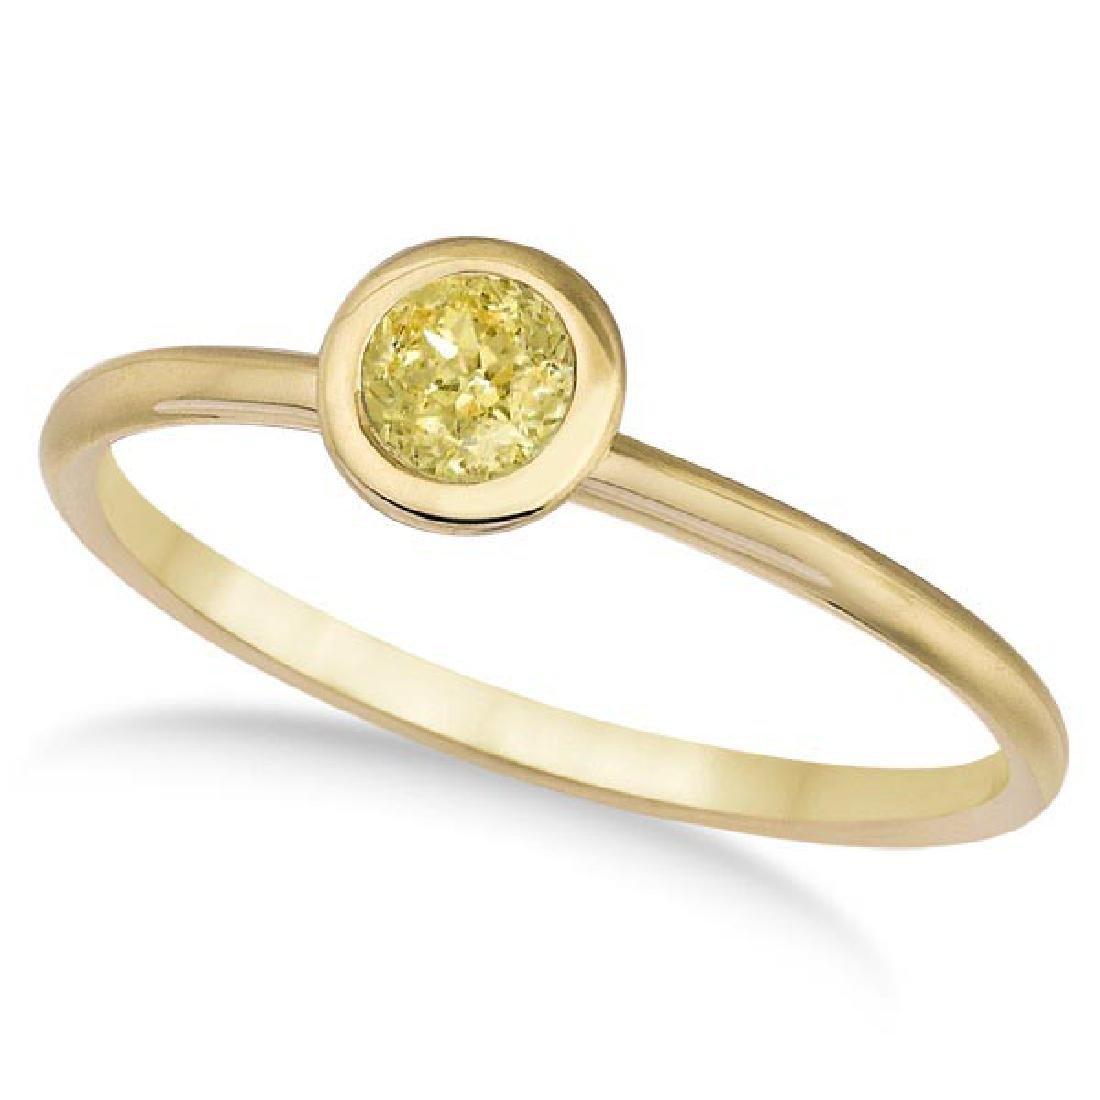 Fancy Yellow Canary Diamond Bezel-Set Solitaire Ring 14